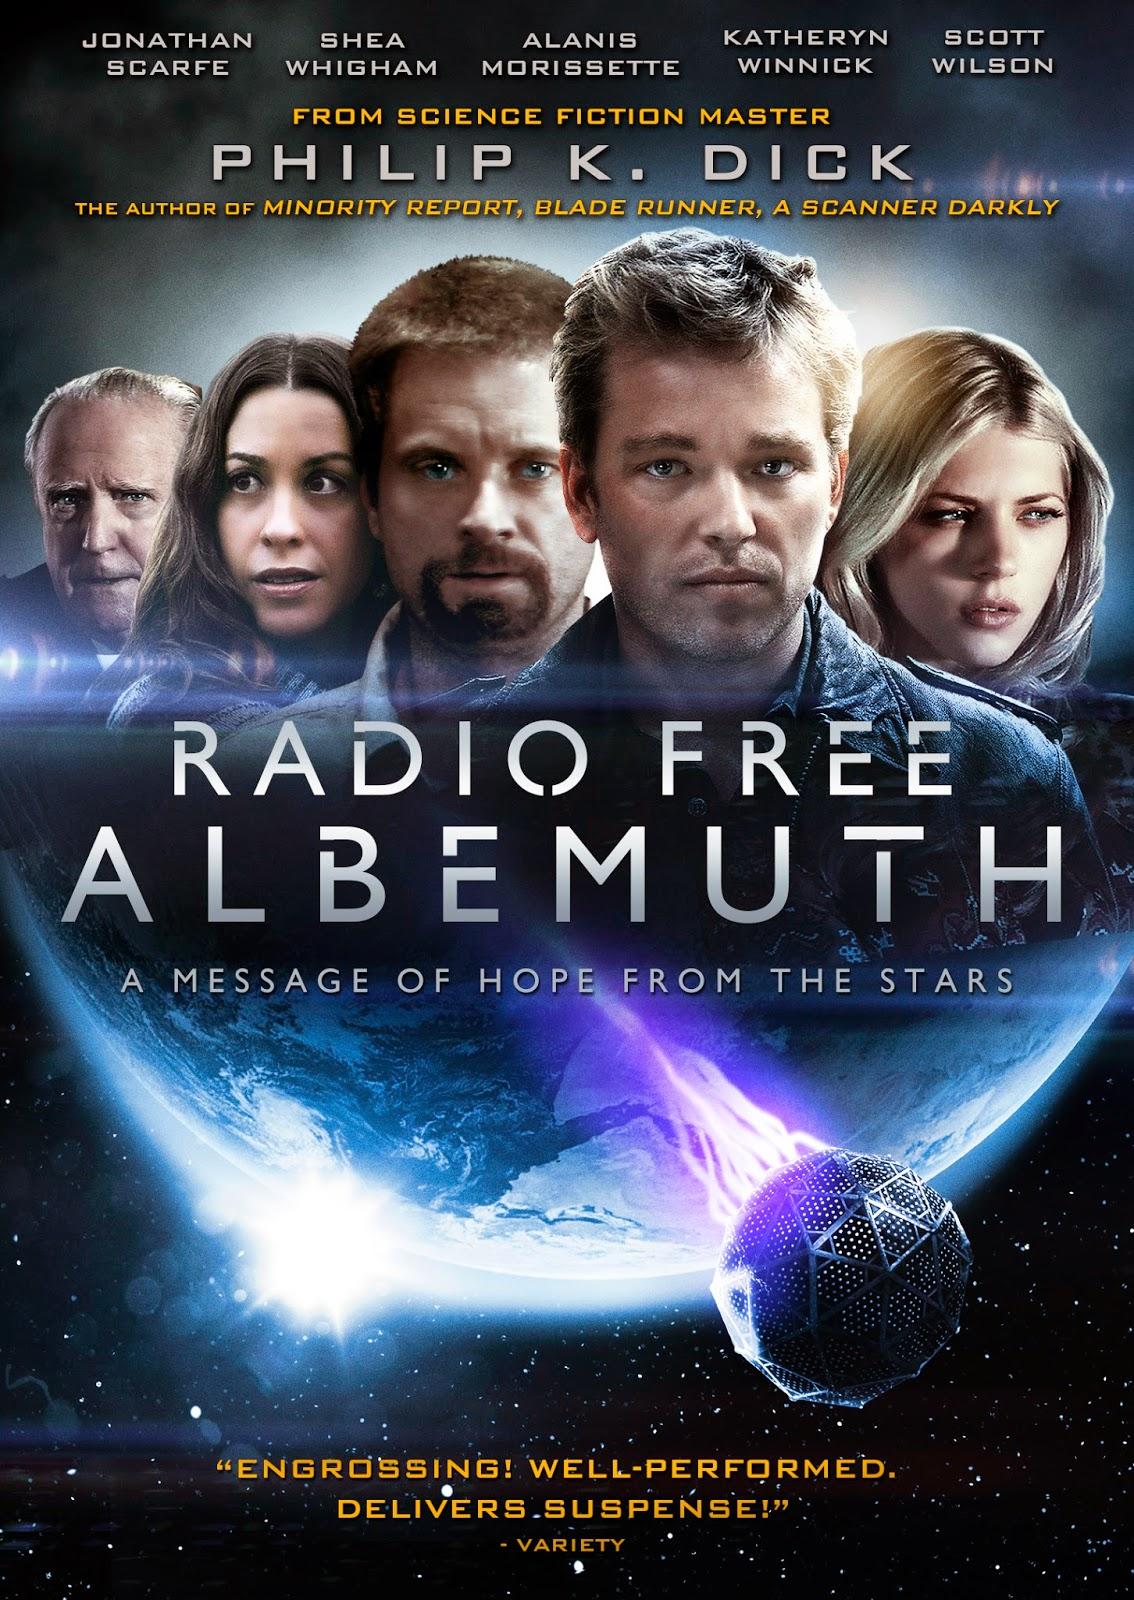 Bob Canadas Blogworld Dvd Doppelgangers Prometheus Vs Prometheus Trap Vs Radio Free Albemuth